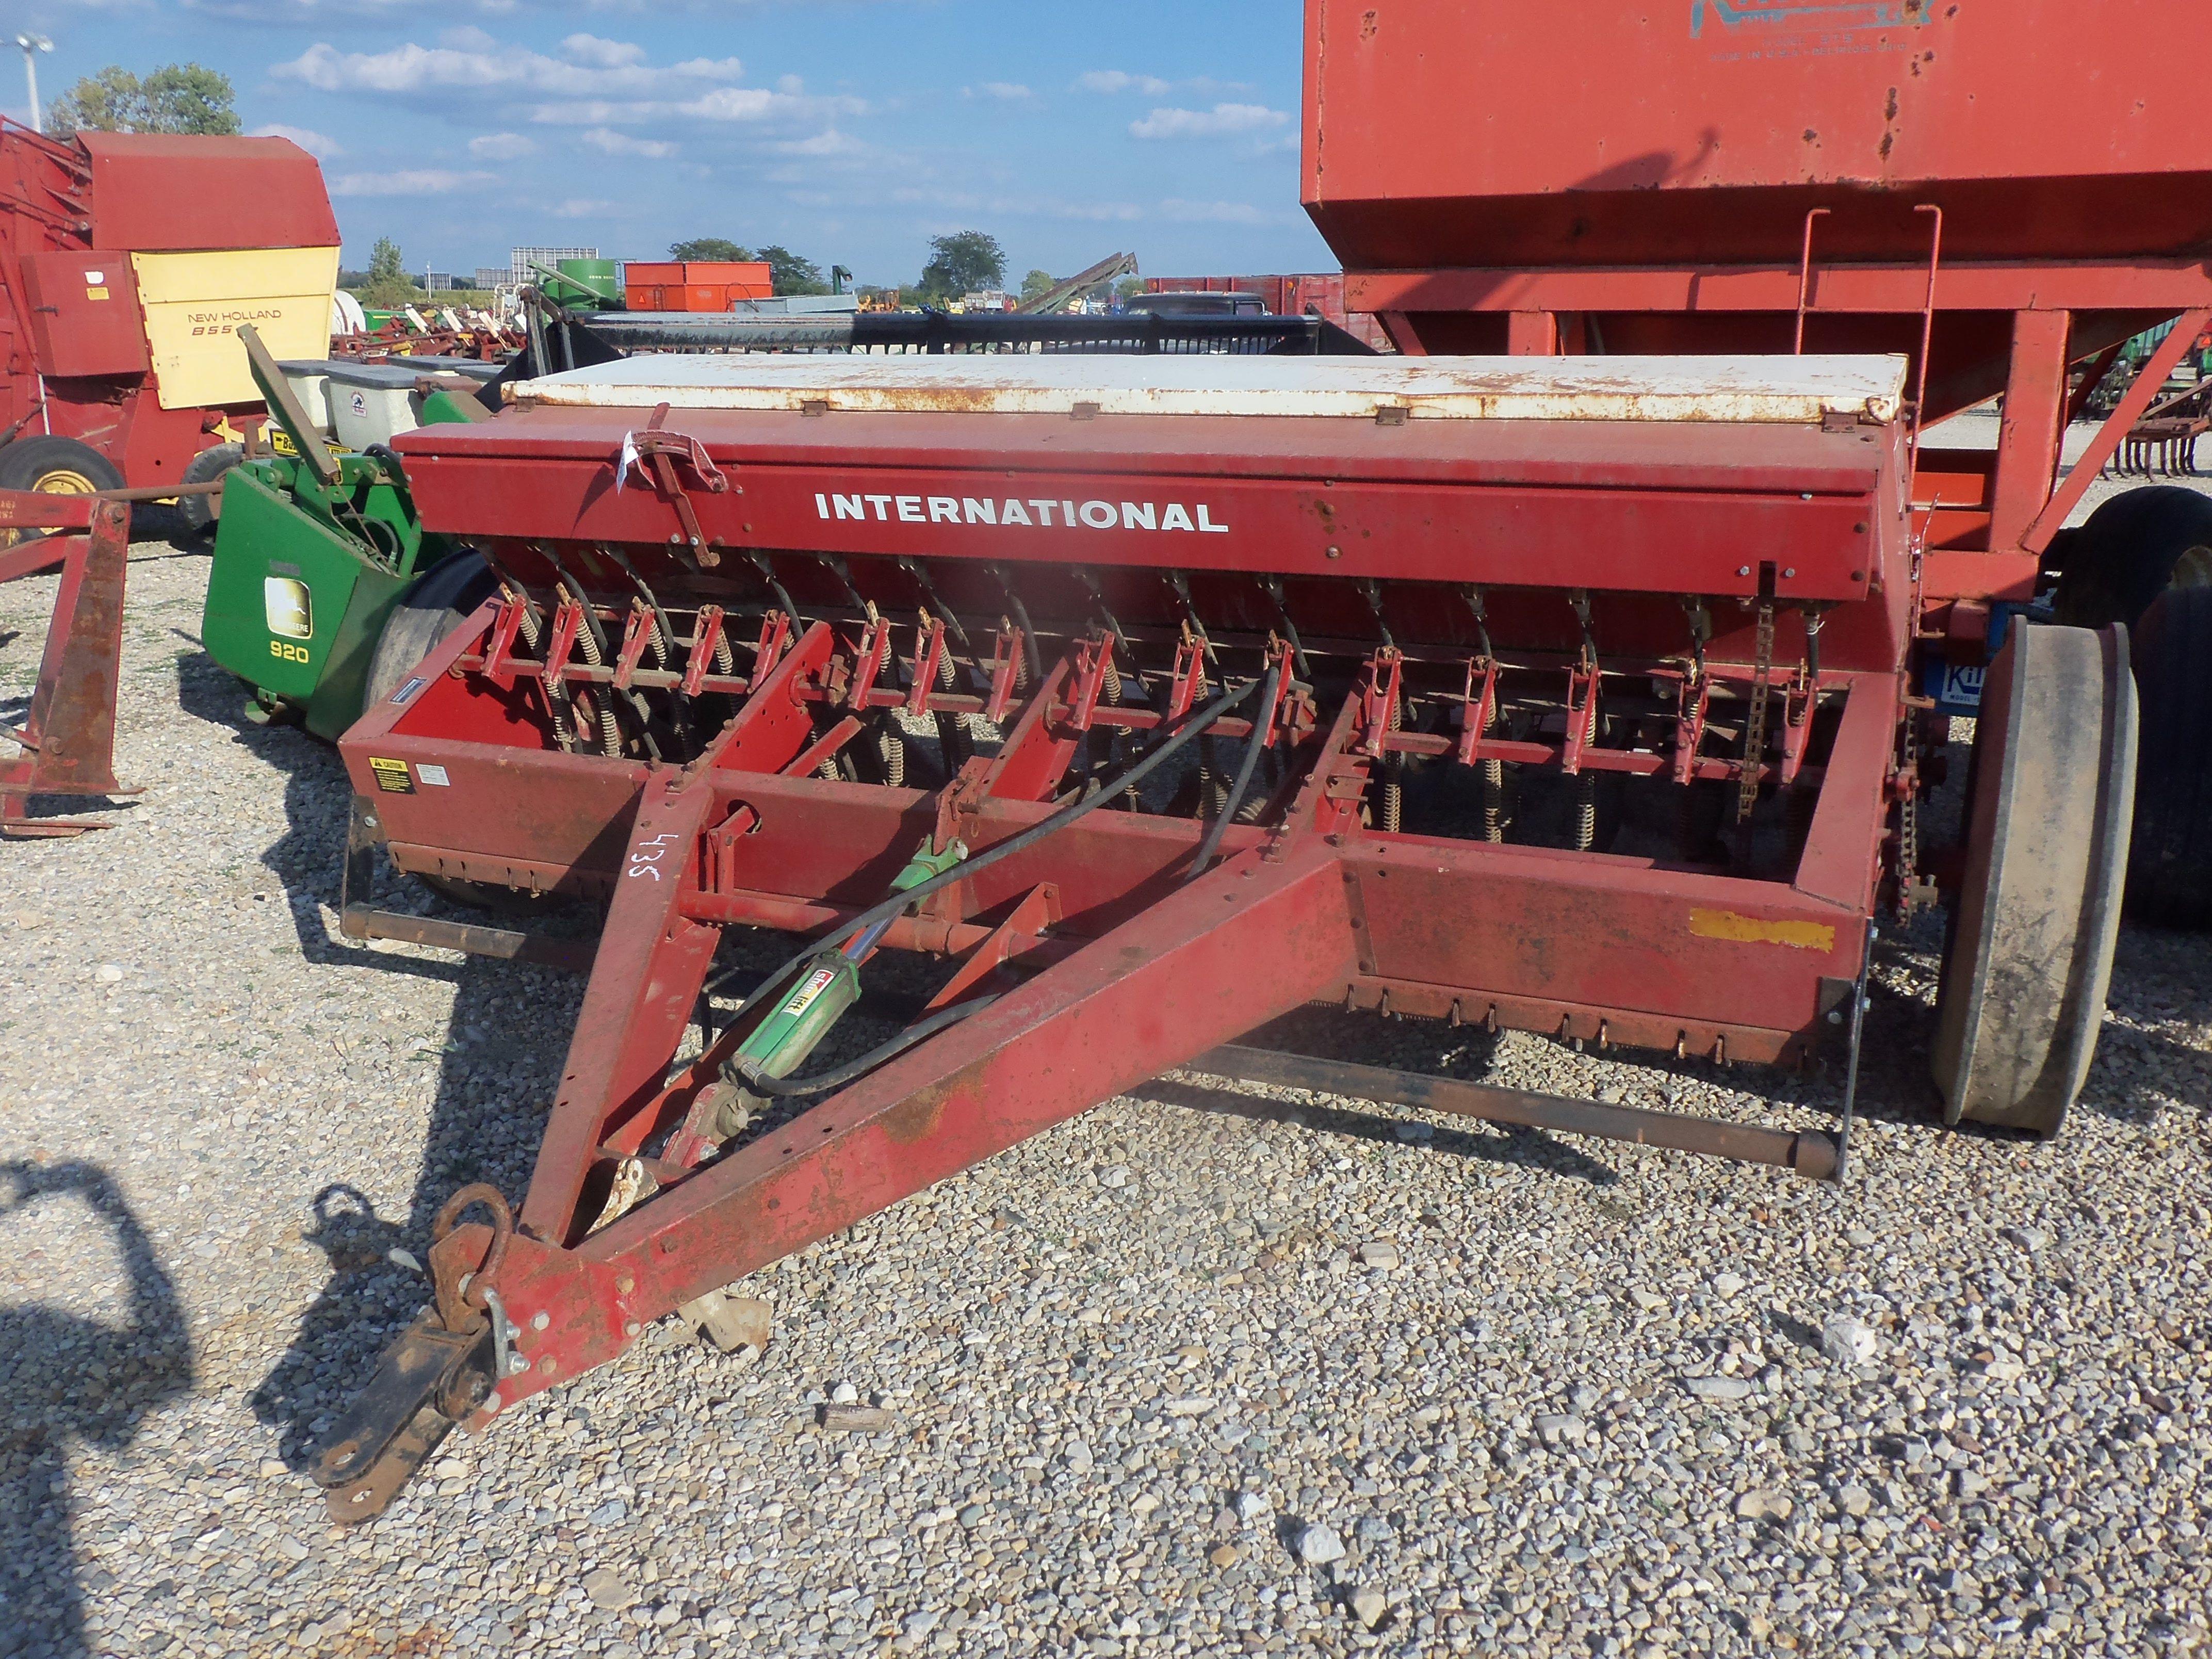 International 510 Grain Drill Construction Equipment Farm Equipment Farmall